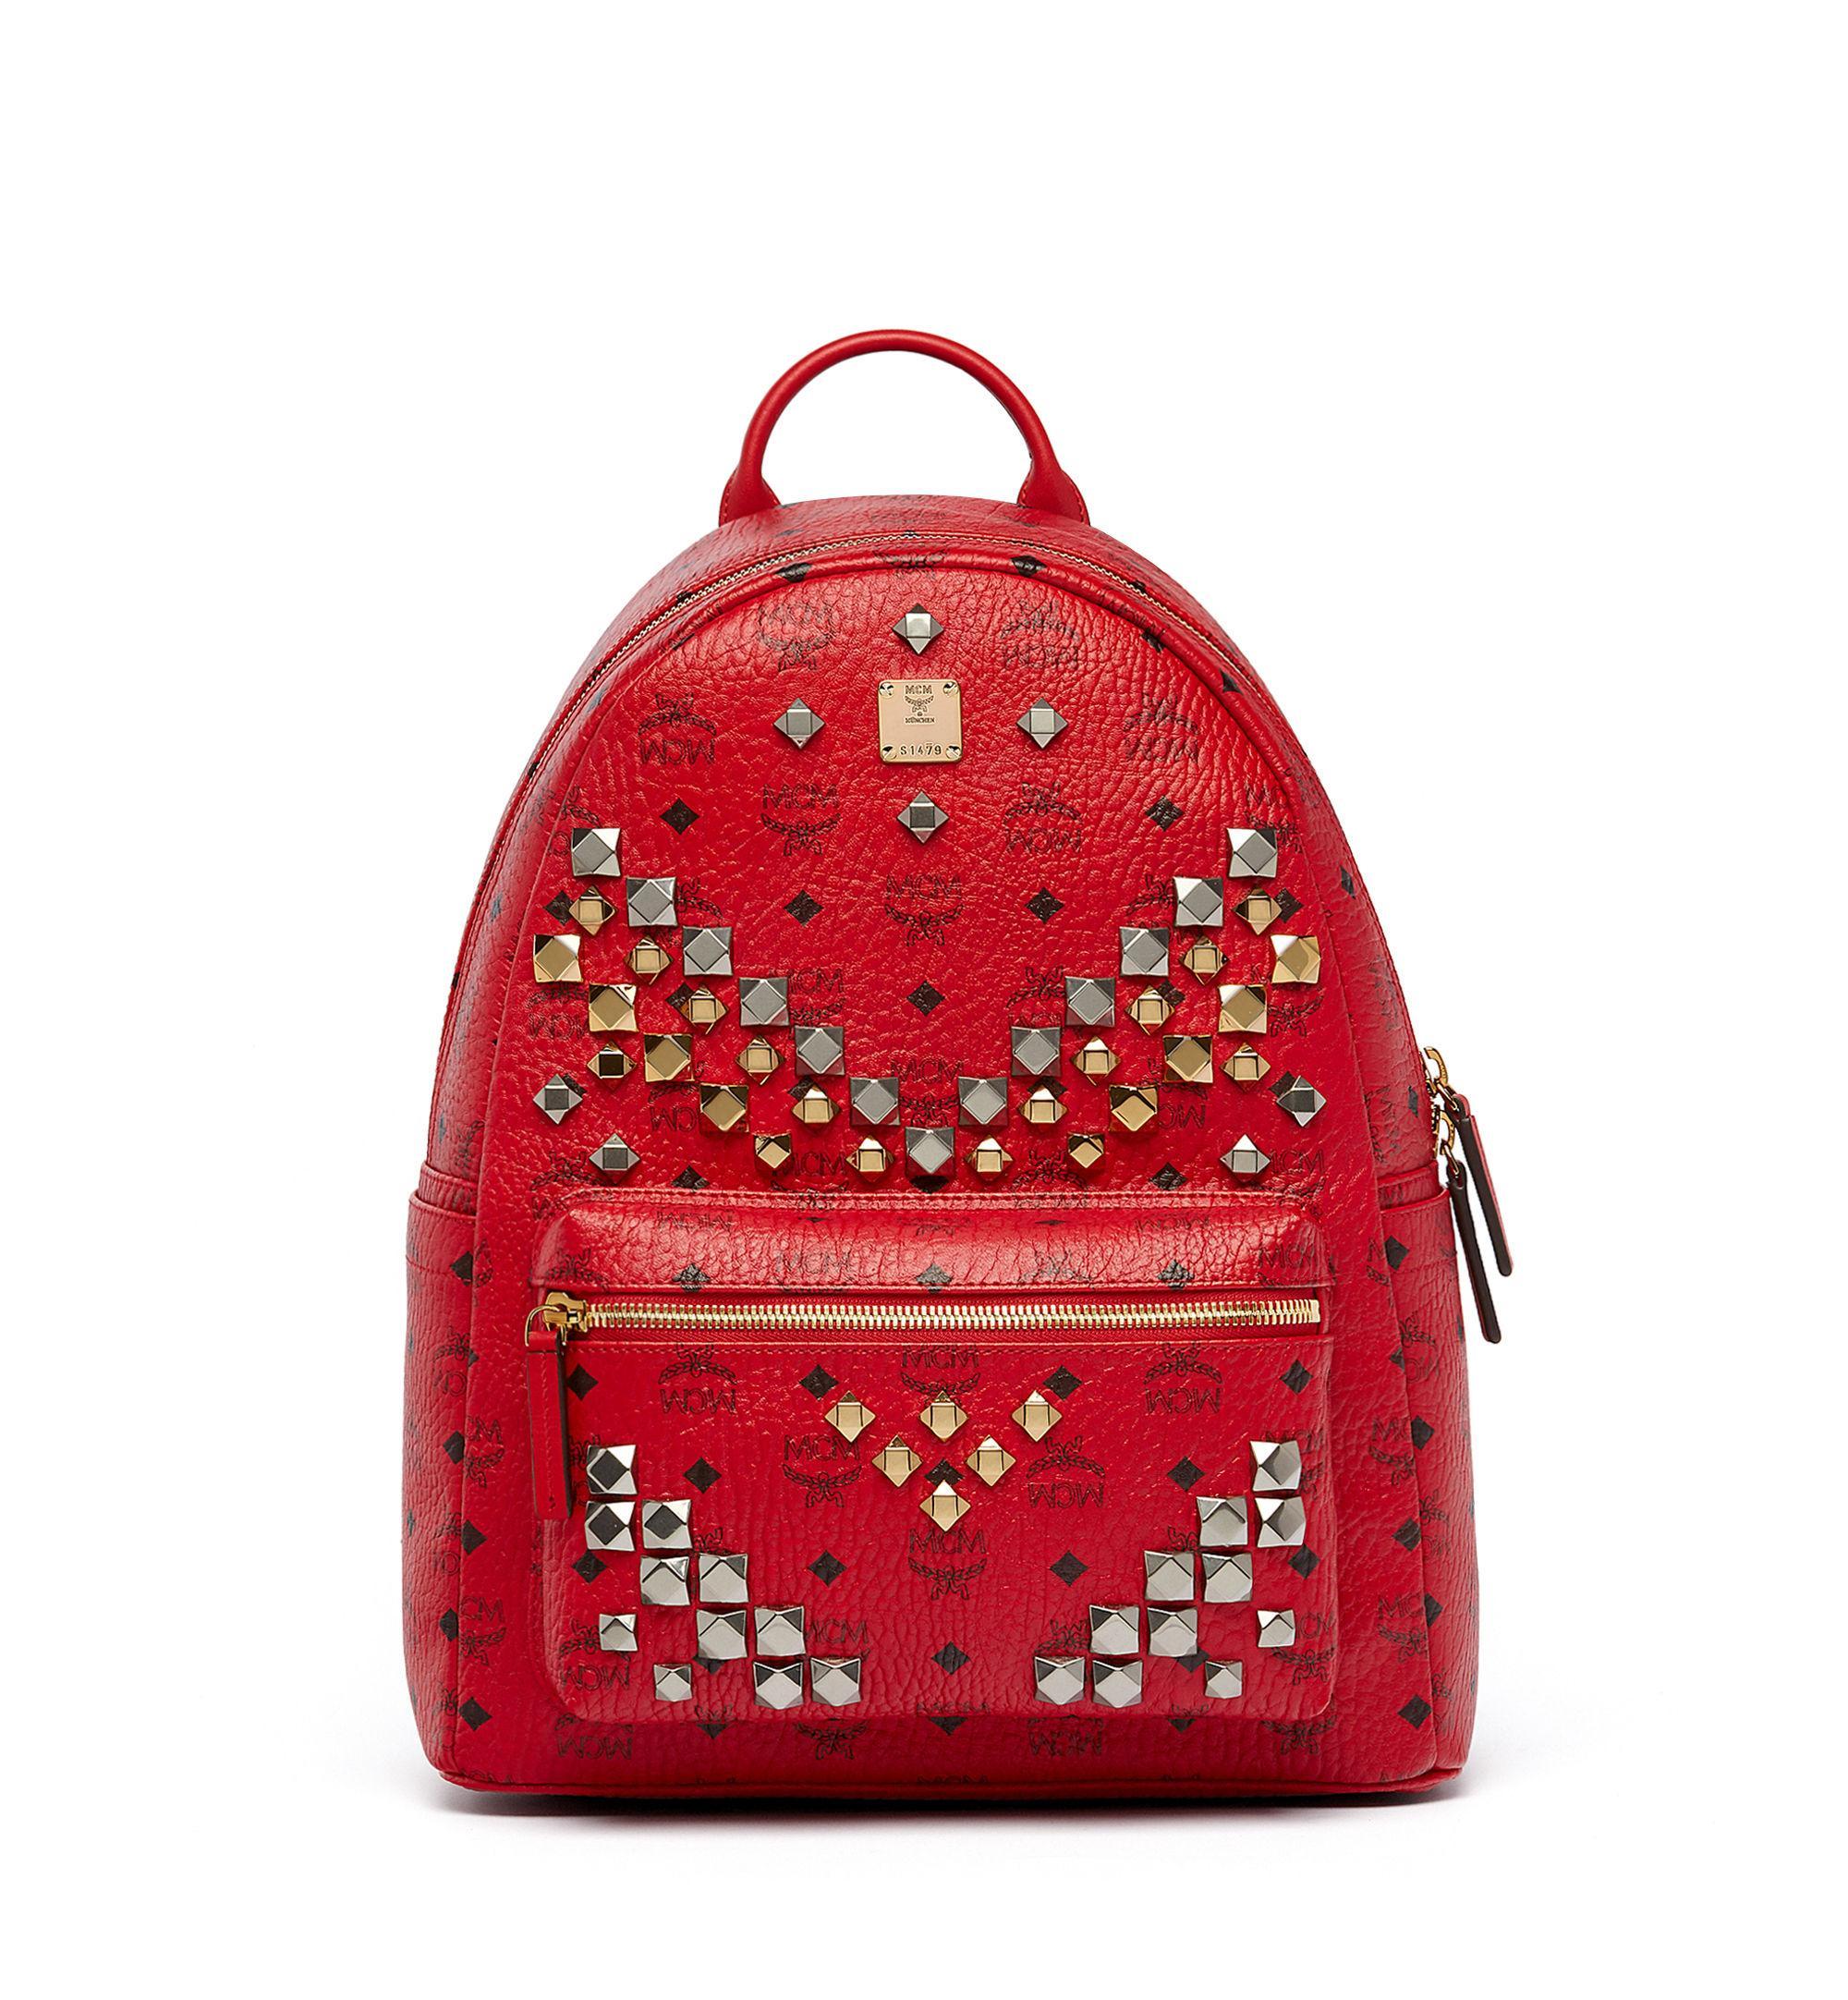 mcm stark m studded medium canvas backpack in red lyst. Black Bedroom Furniture Sets. Home Design Ideas